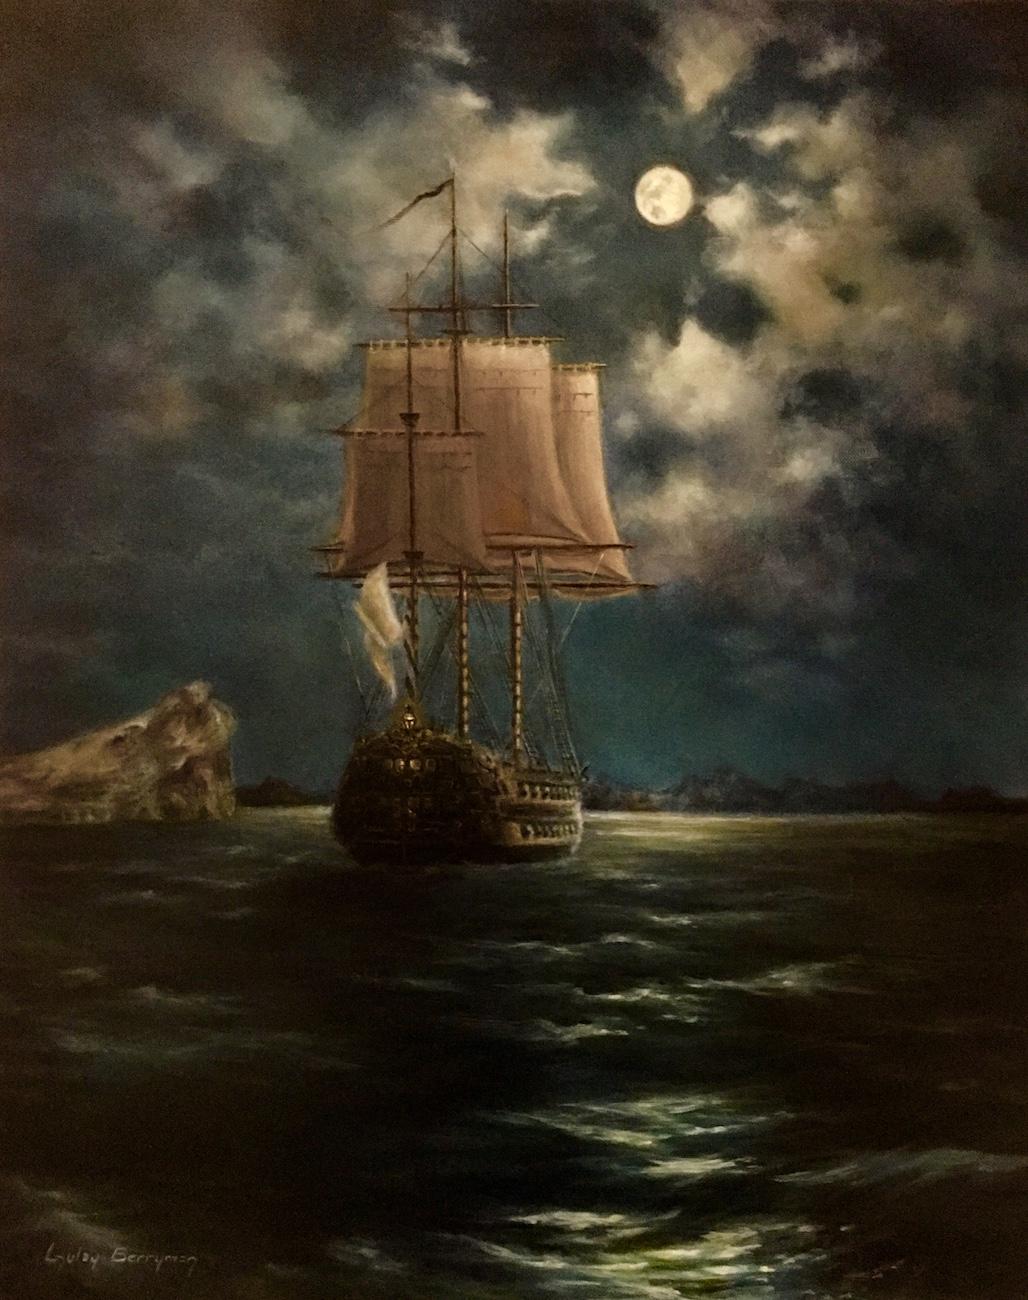 The 'Hero' Returns on a Moonlit Night